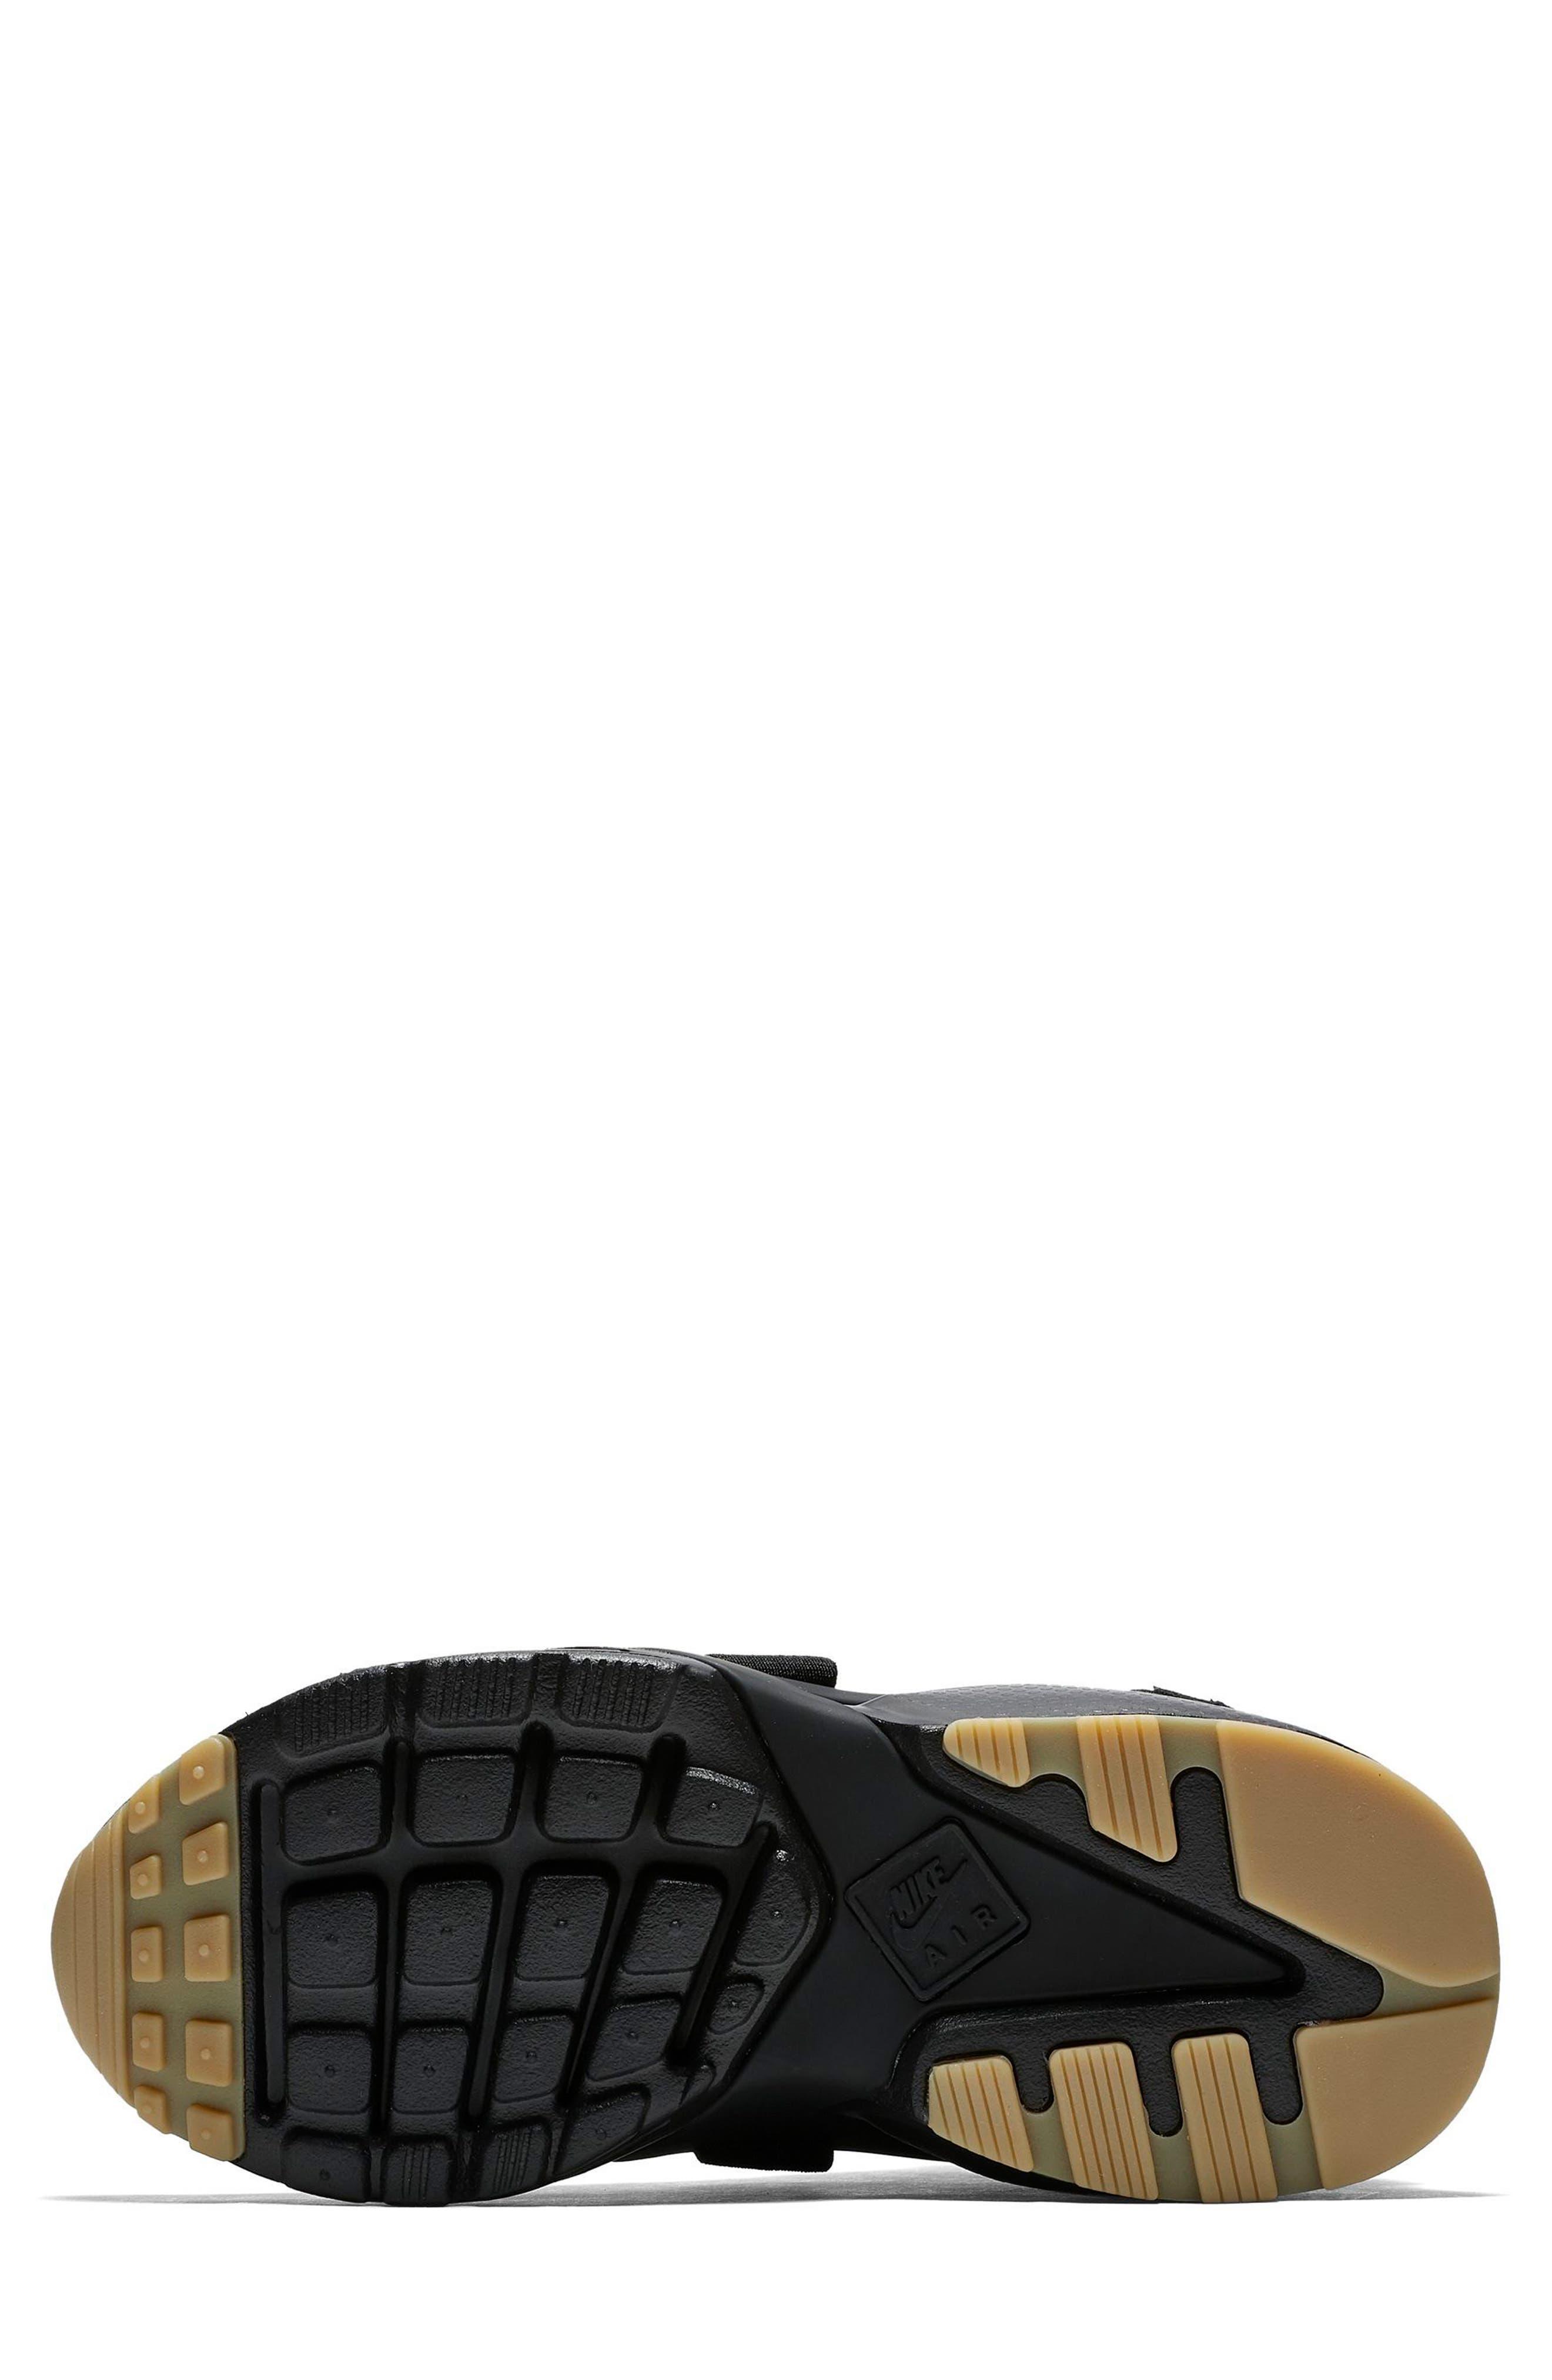 Air Huarache City Sneaker,                             Alternate thumbnail 5, color,                             BLACK/ BLACK/ DARK GREY